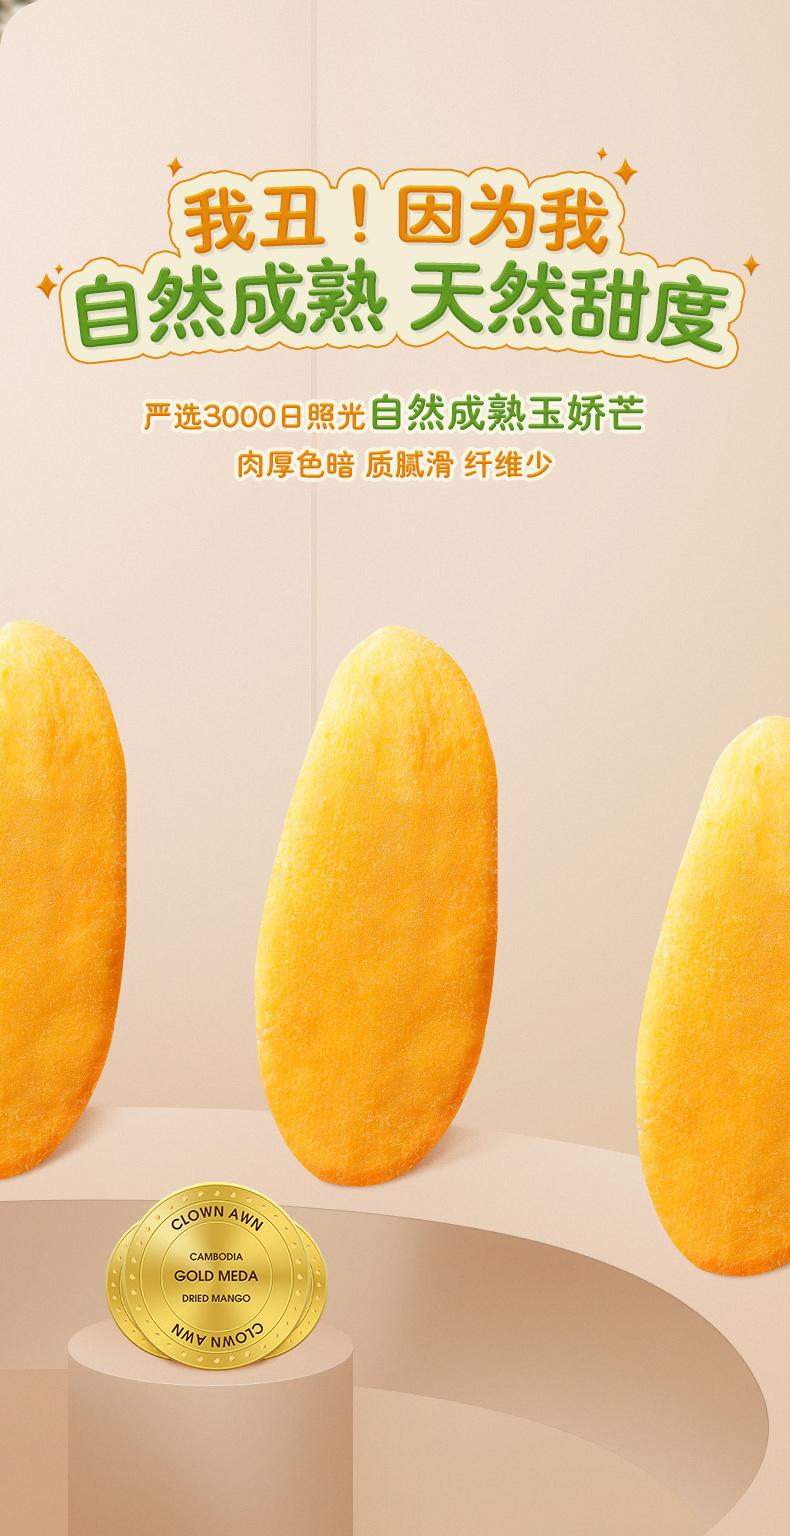 【88g*3袋】中宝芒果干3